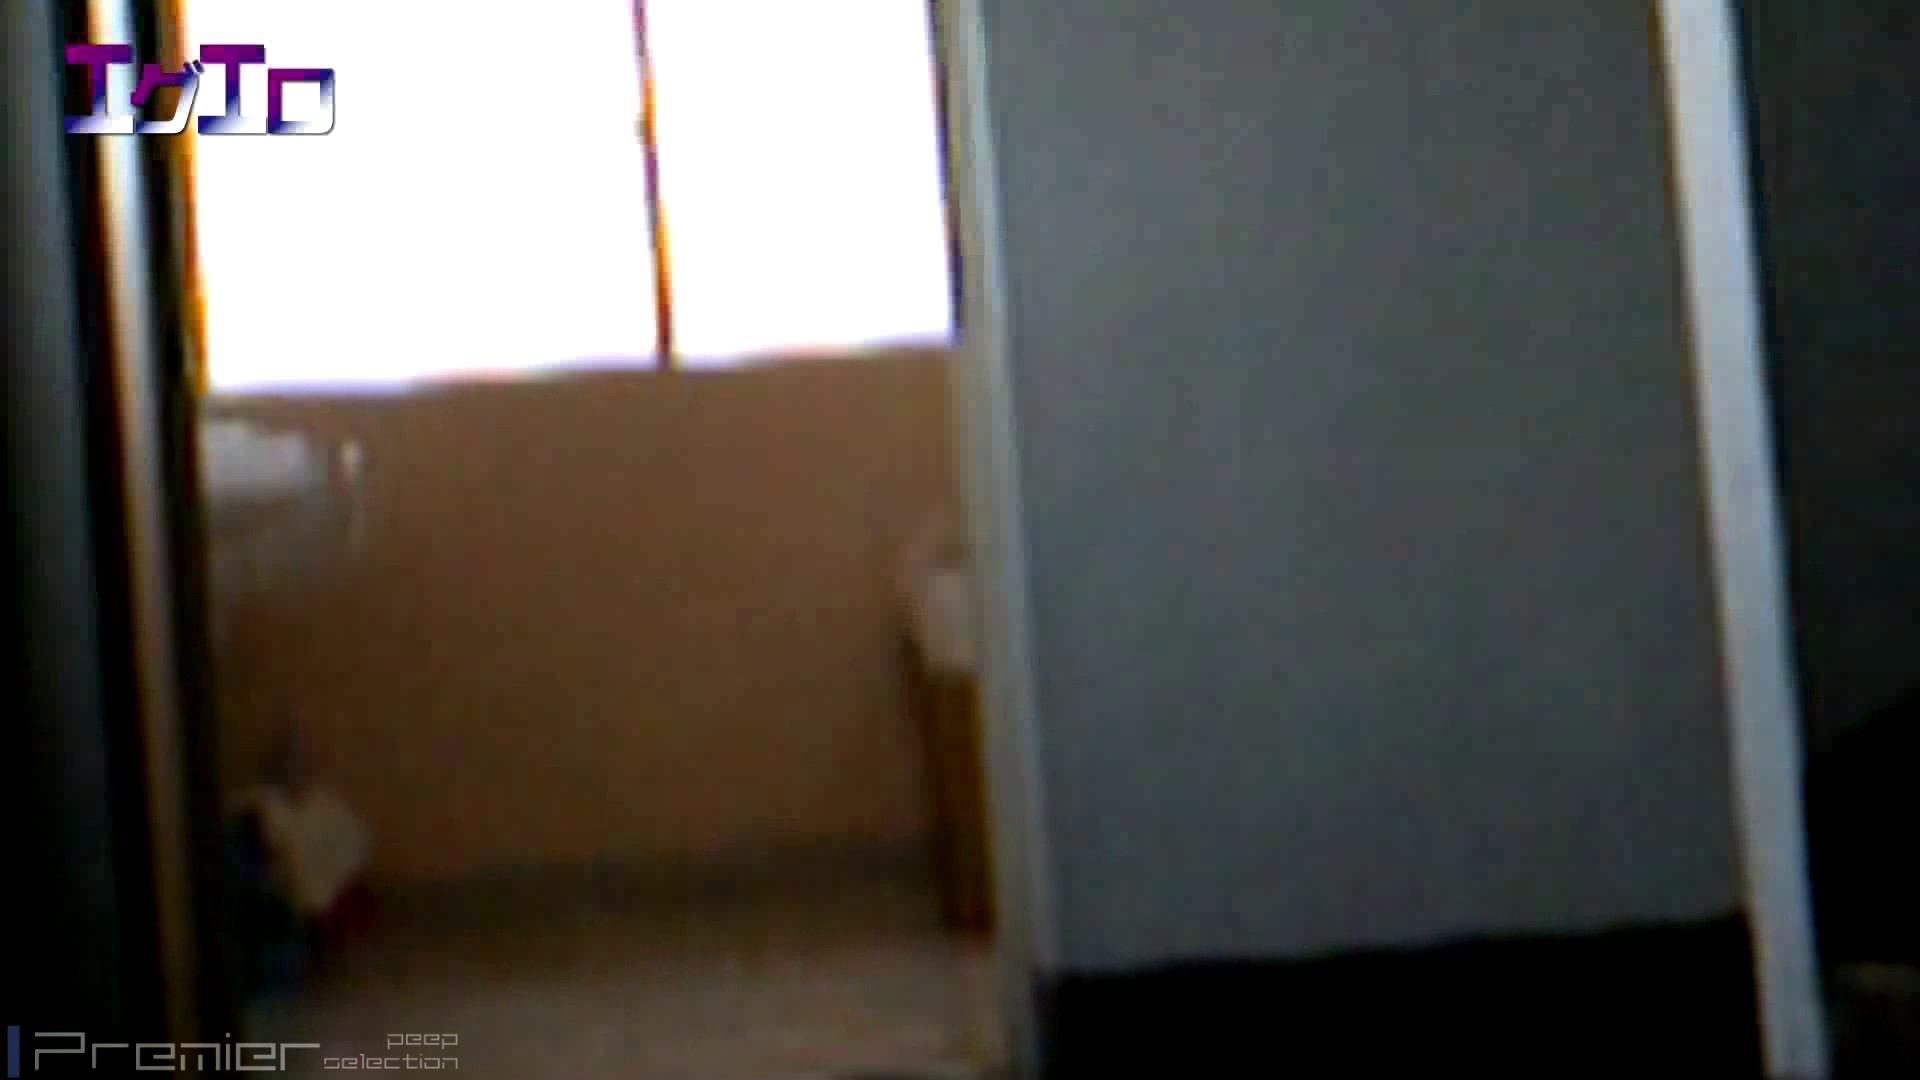 至近距離洗面所 Vol.08 細身・スレンダー 性交動画流出 48画像 4